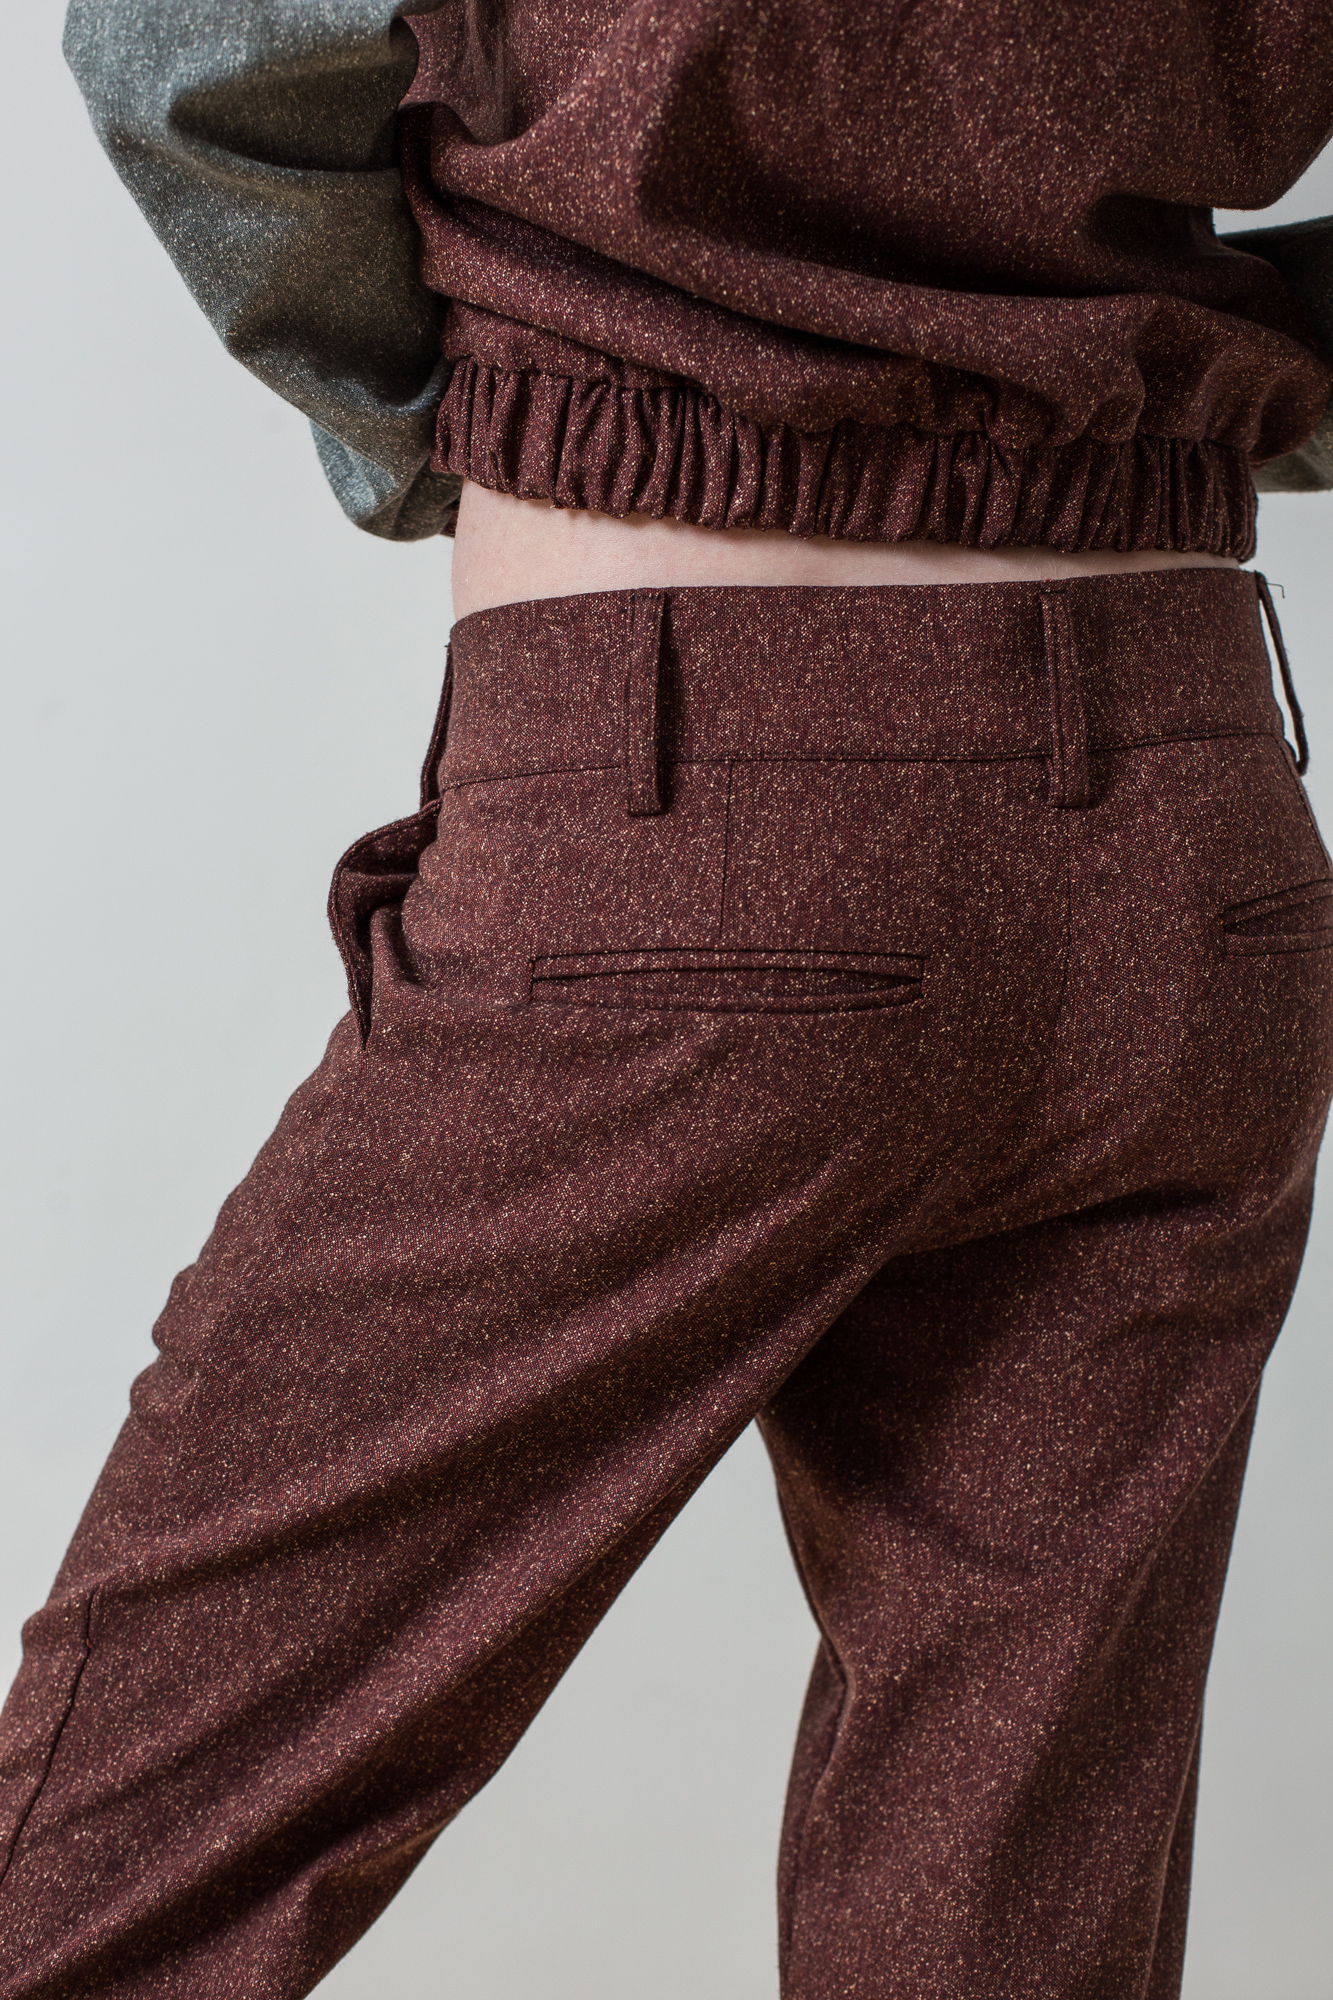 wearenotsisters_wrns_sculpture-pants_05